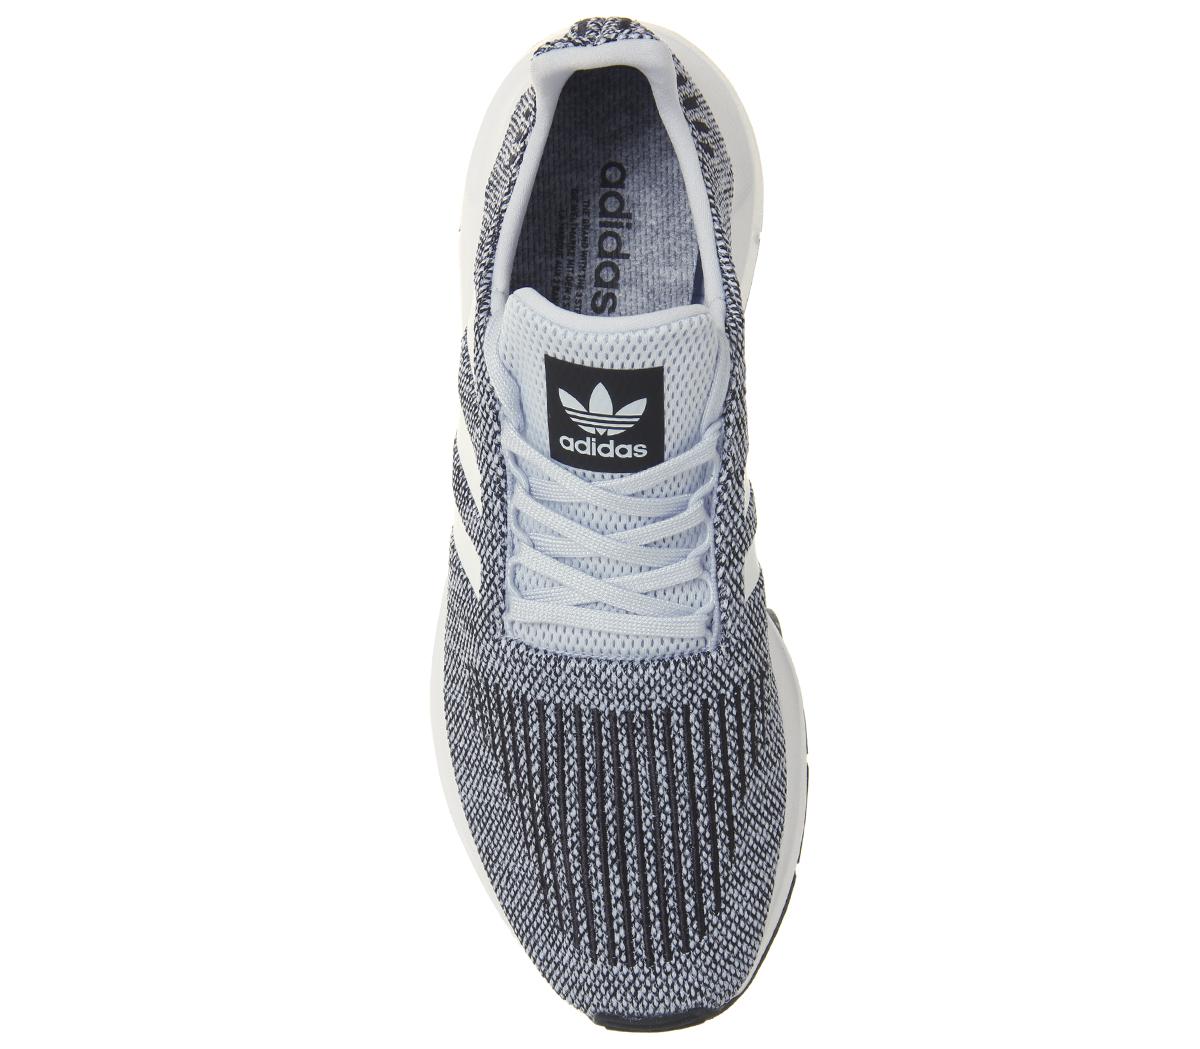 Mens Adidas Swift WHITE Run Trainers AERO BLUE WHITE Swift Trainers Shoes b80d95